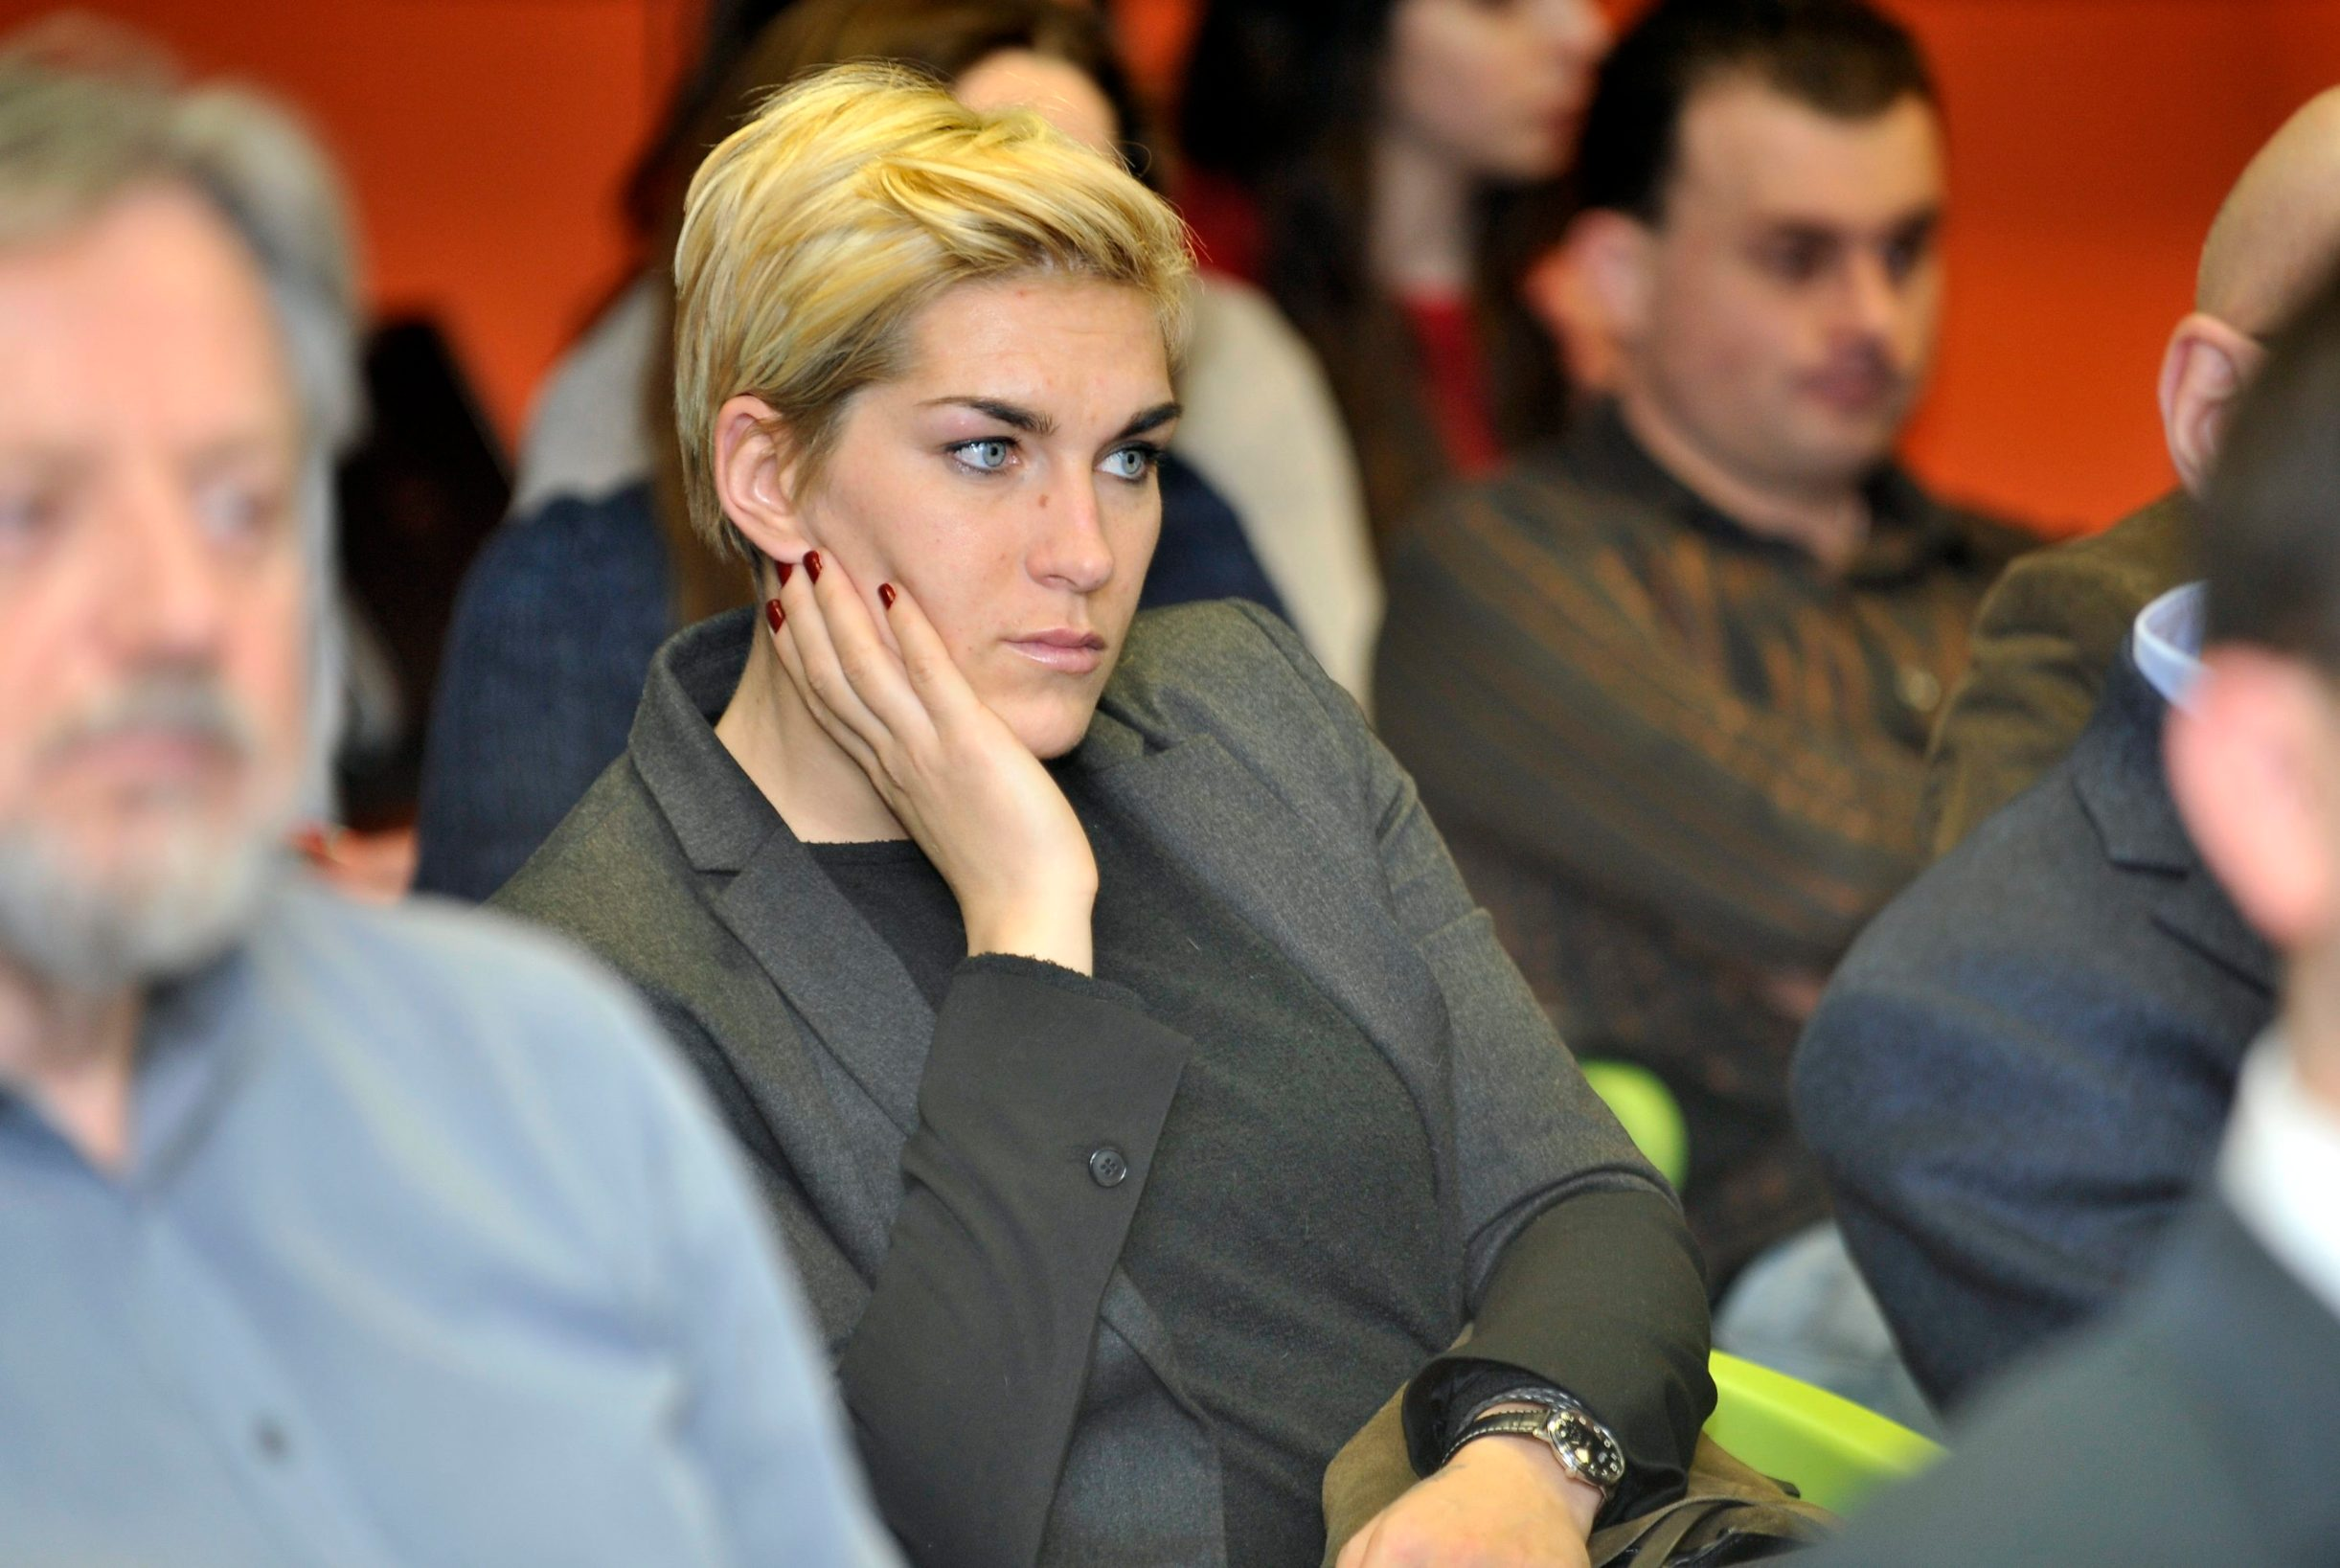 televizija_vern3-250113